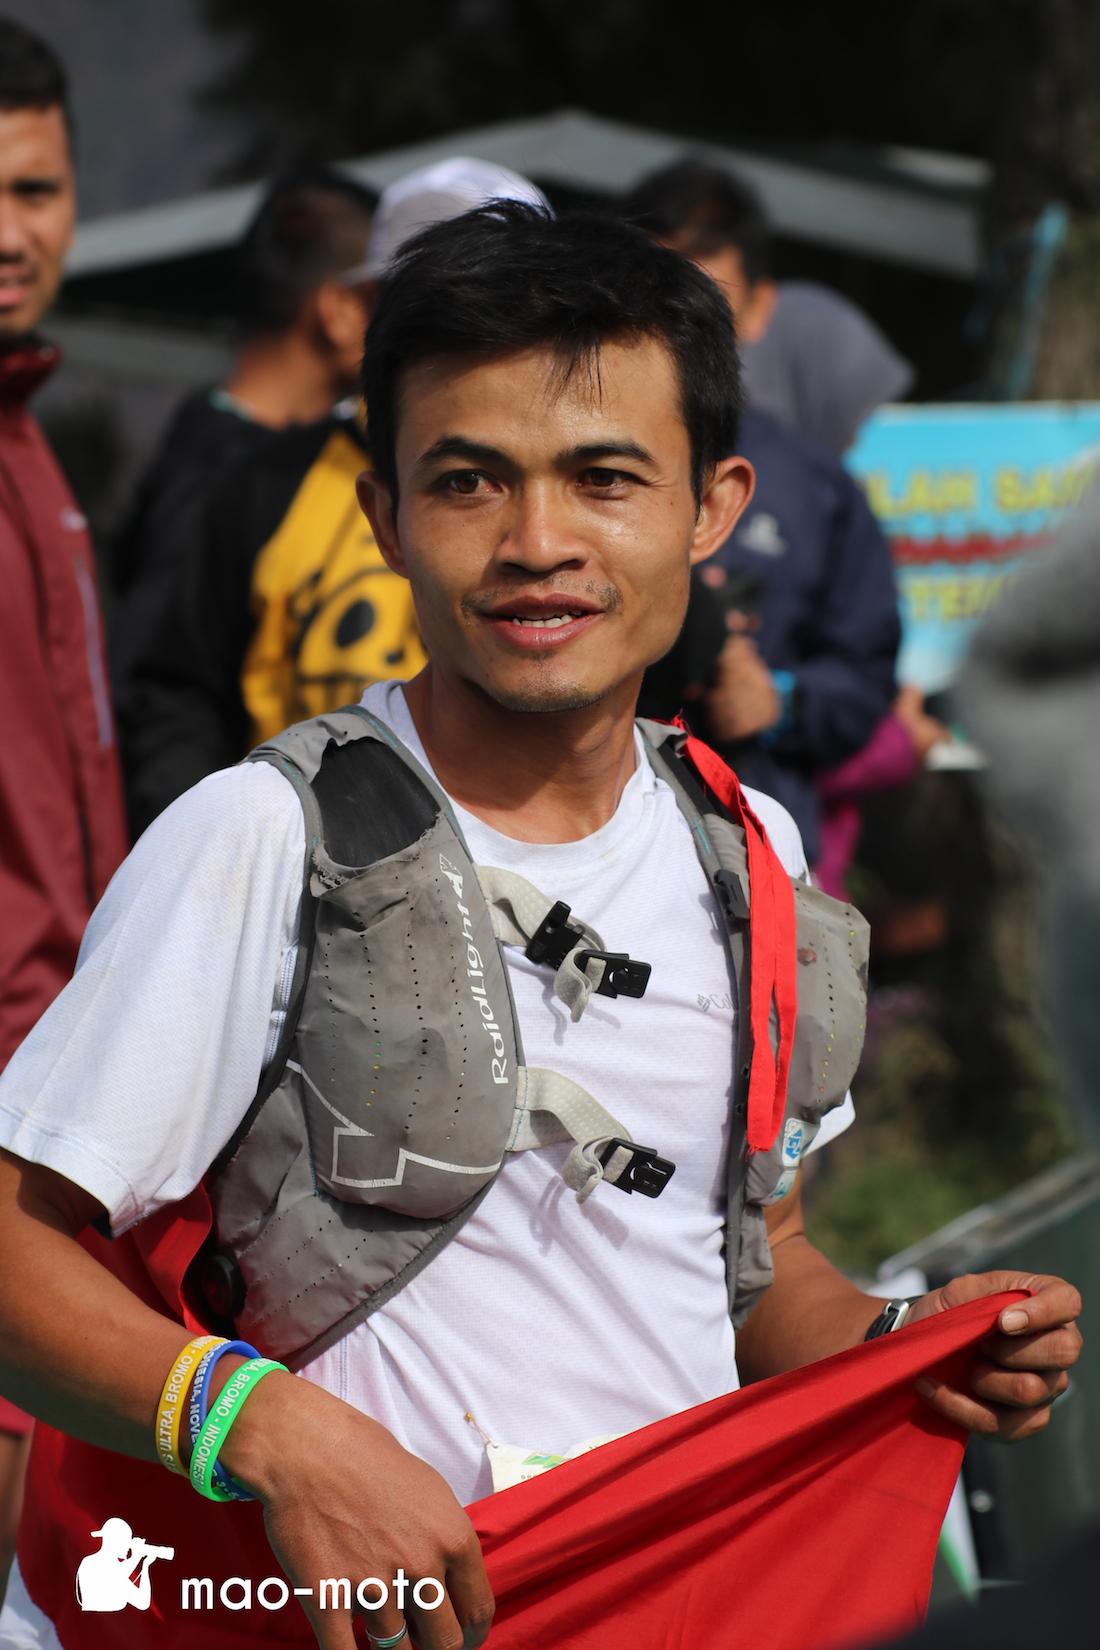 Arief Wismoyono - Indonesia3rd Male * Grandmaster